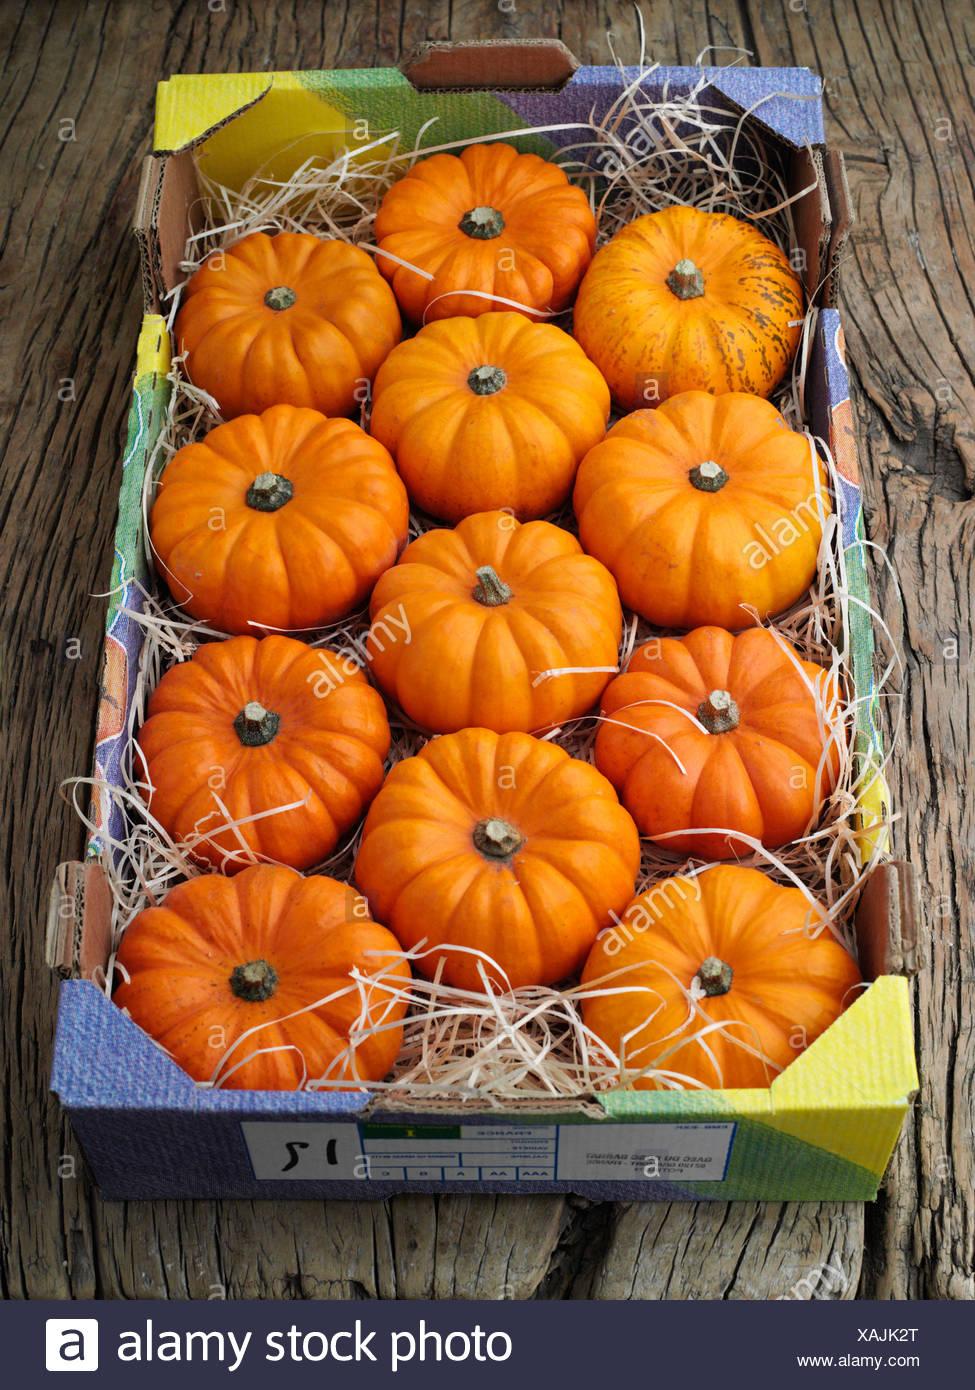 Box of Munchkin Pumpkins - Stock Image